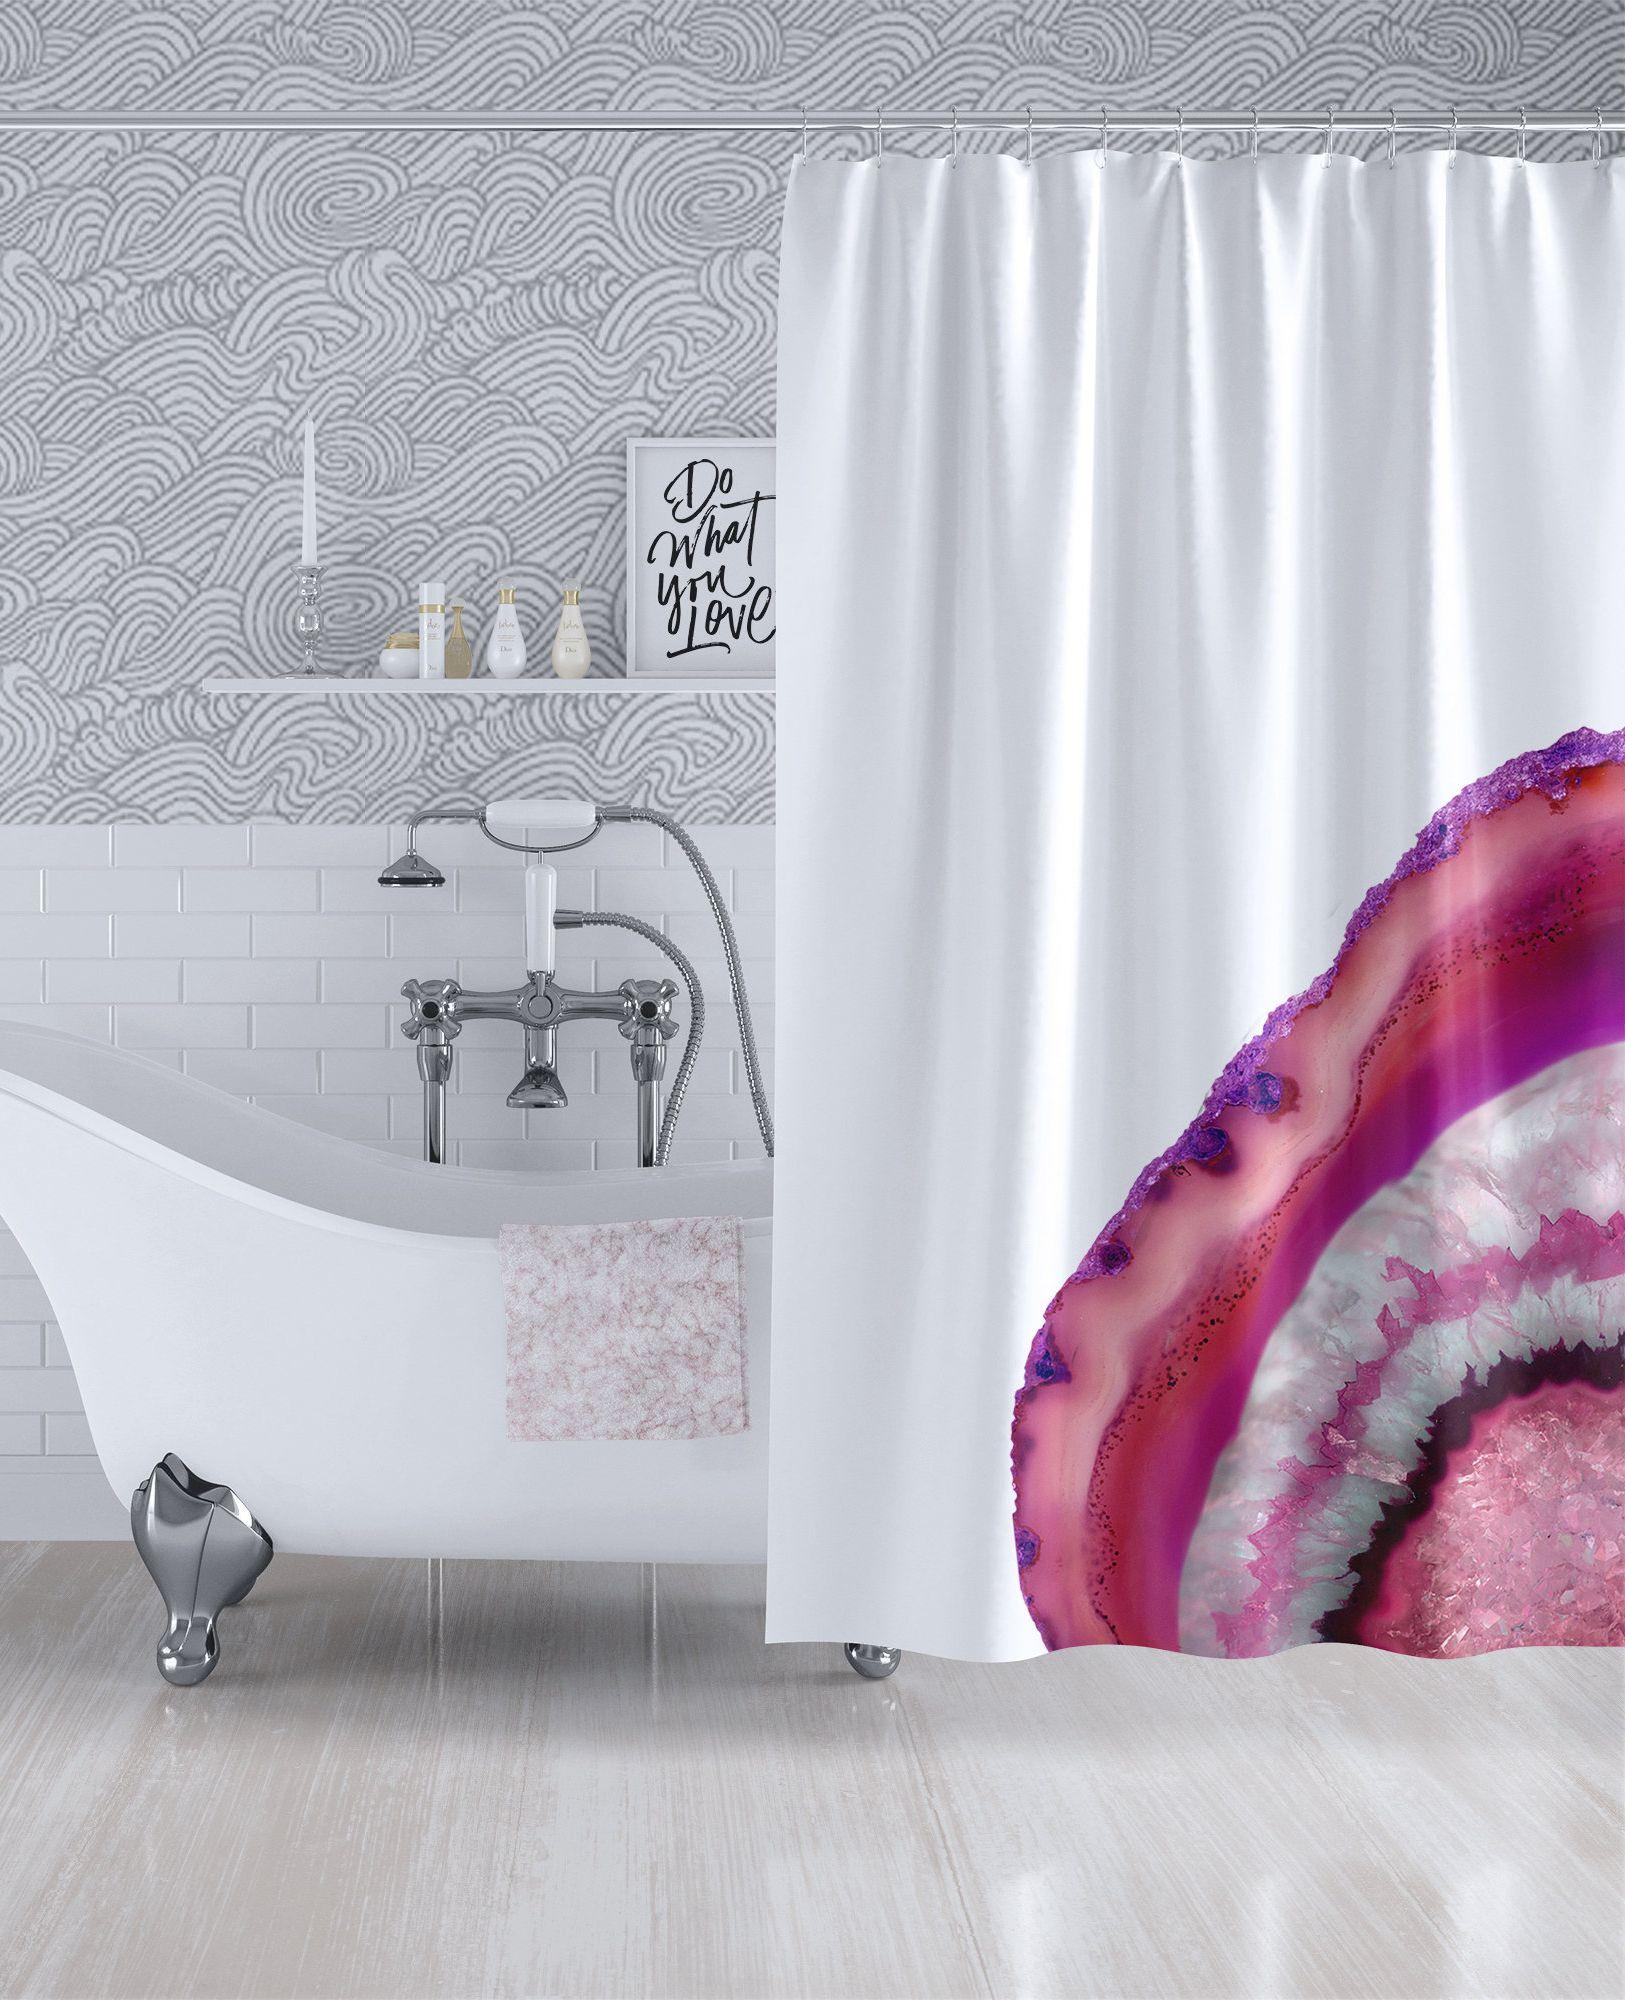 Pink Geode Slice Custom Shower Curtain Agate Stone Fabric Bath Curtain Machine Washable 90x70 83x70 74x71 Custom Shower Curtains Fabric Shower Curtains Modern Curtains